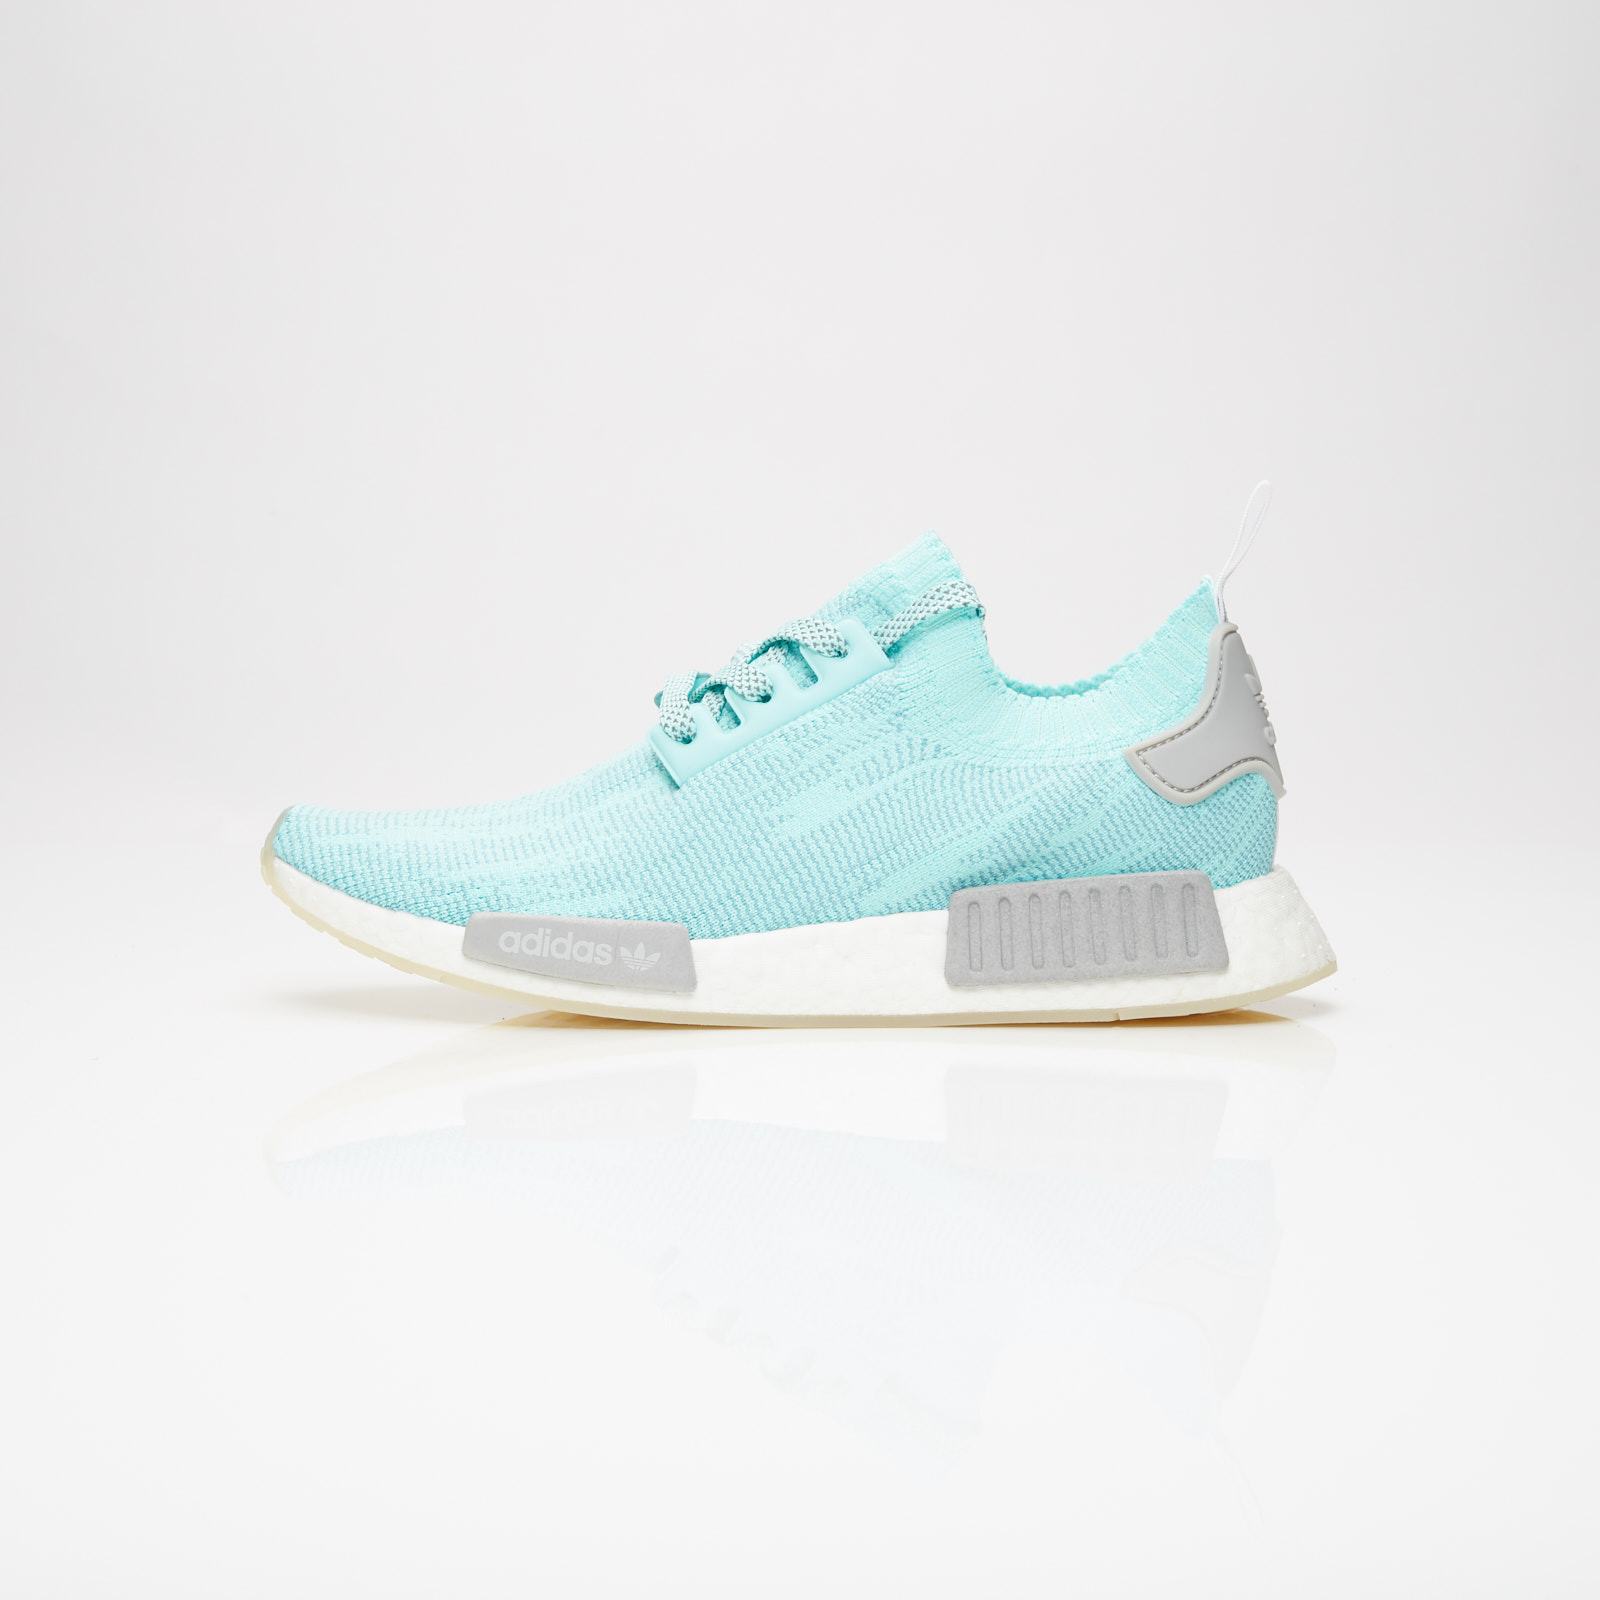 1c809b2e75cfb adidas NMD R1 PK - B43523 - Sneakersnstuff